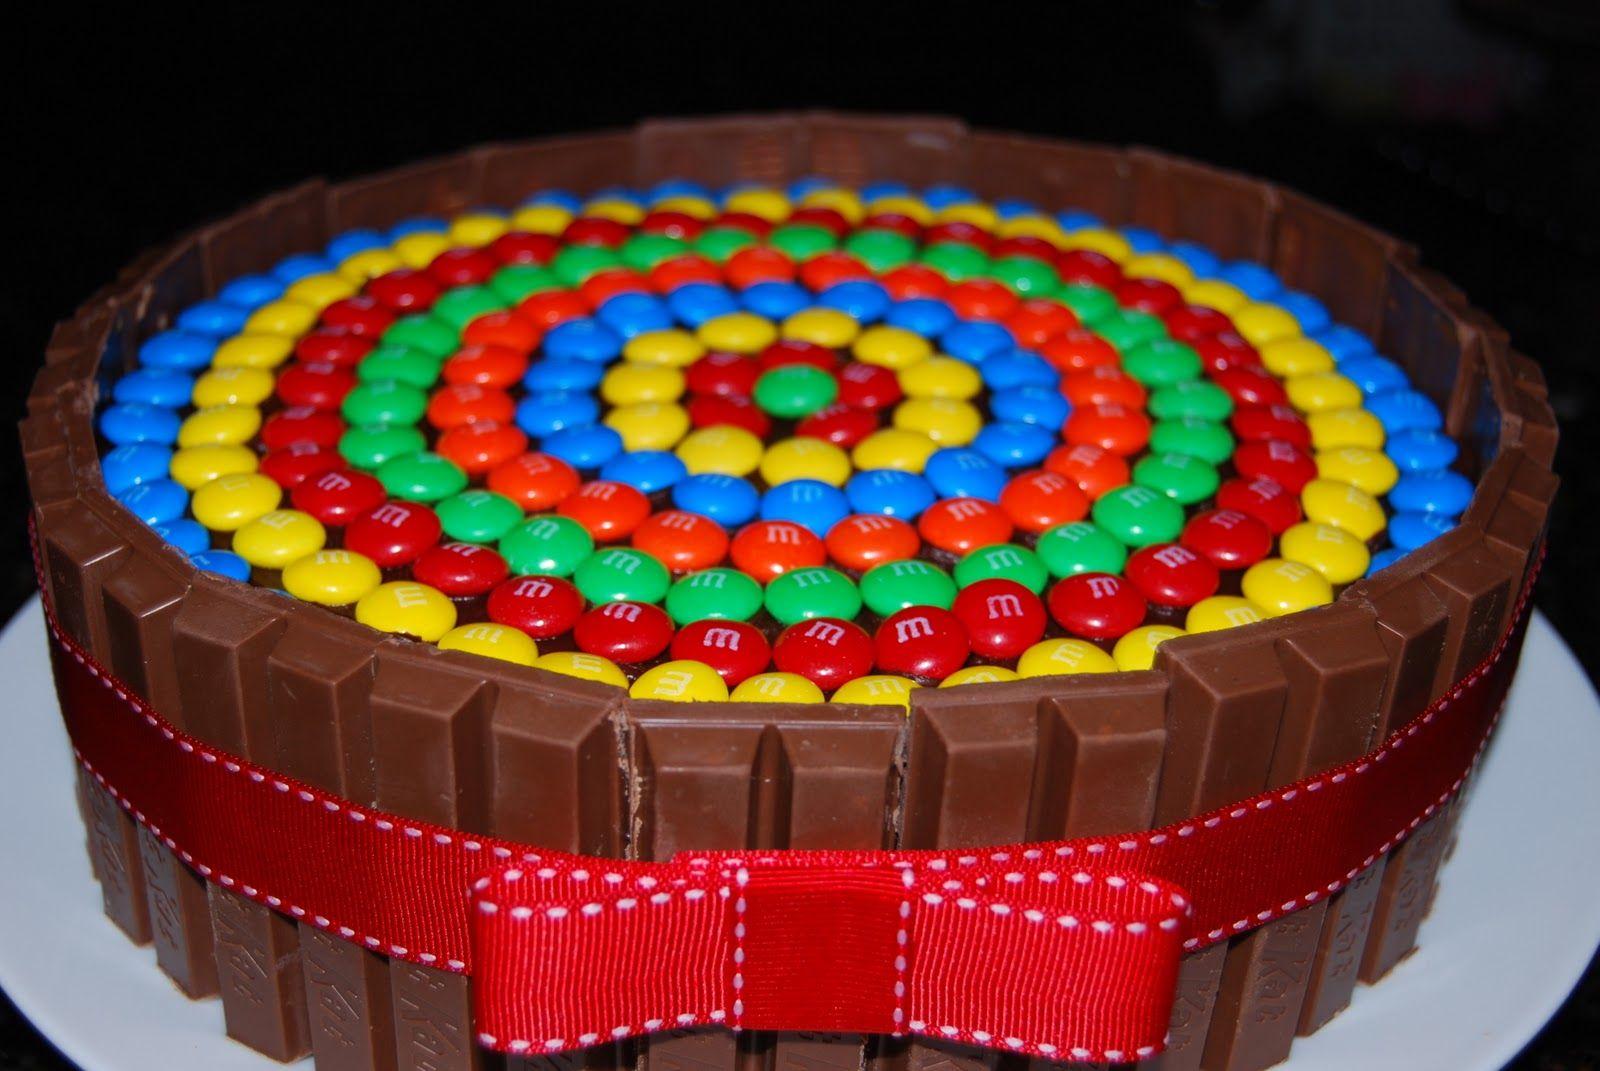 Kit Kat cake. For those of us who like patterns!